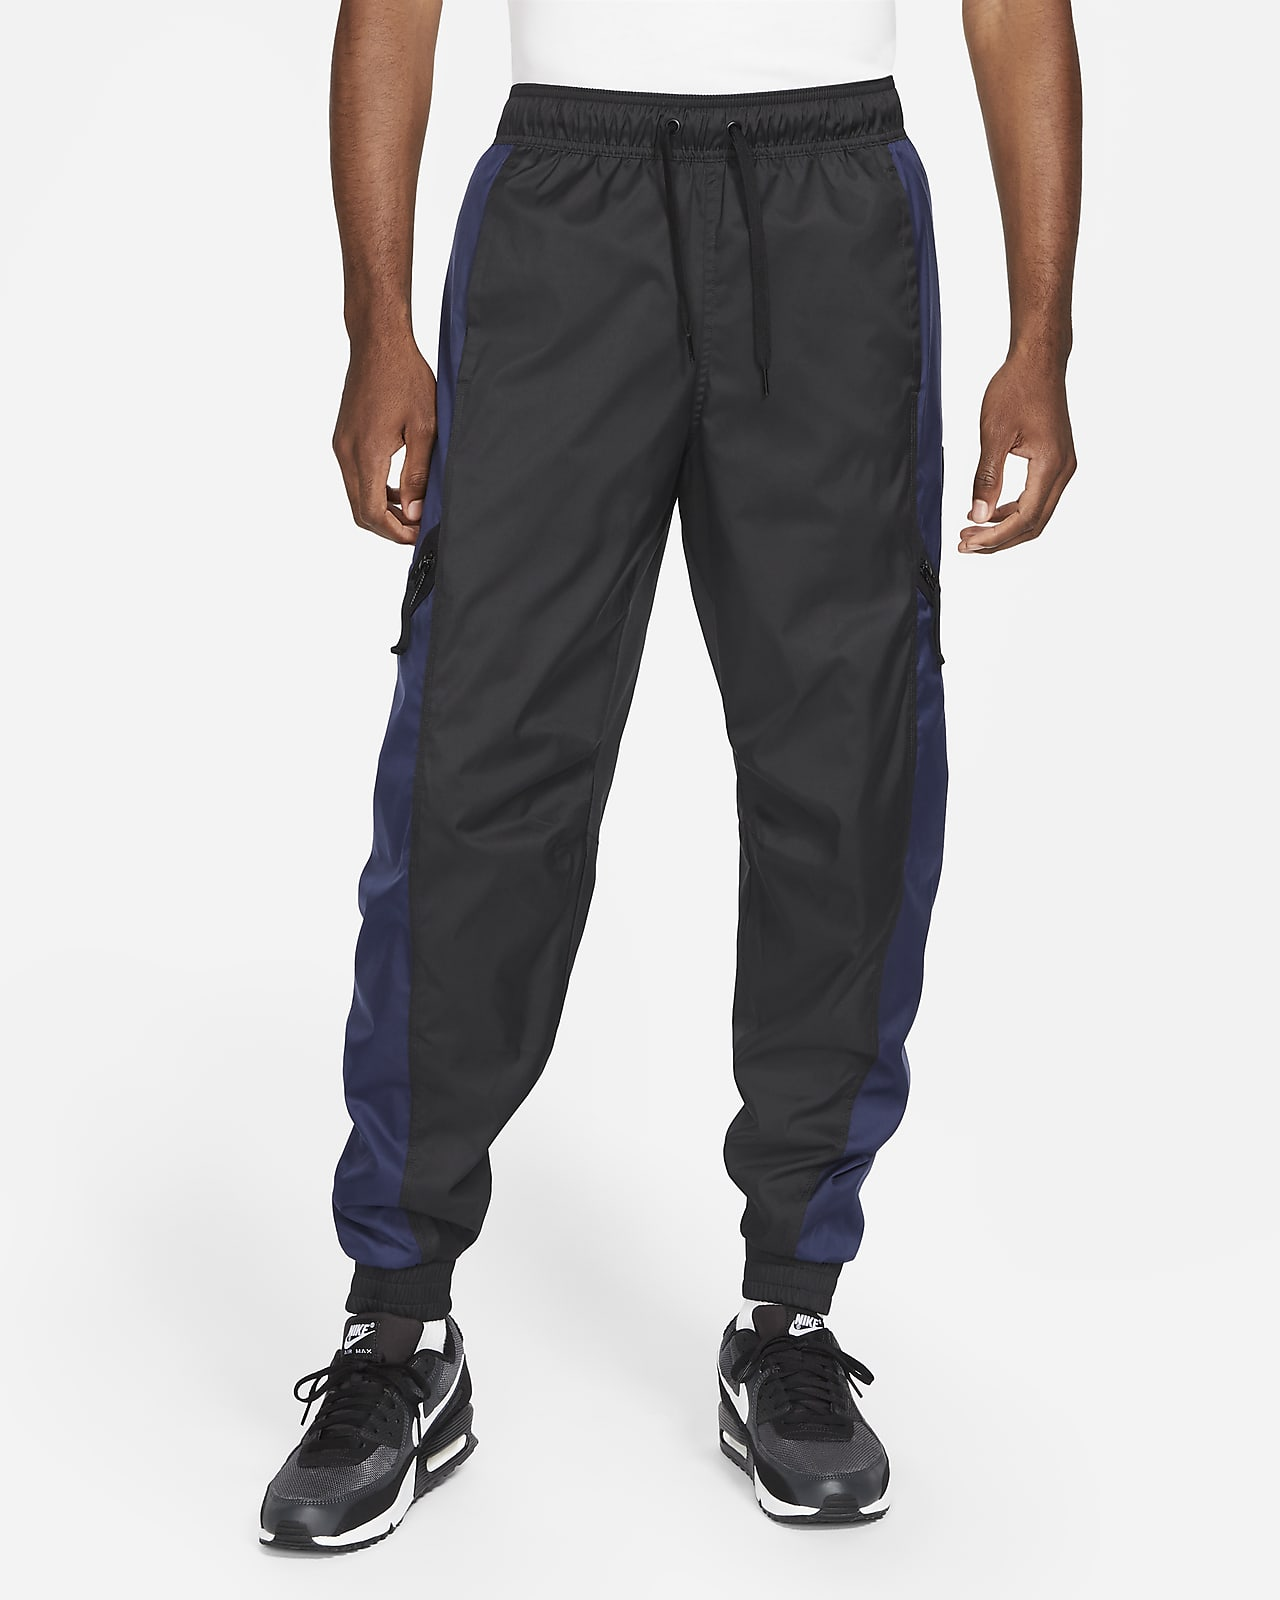 Nike Air Men's Woven Trousers